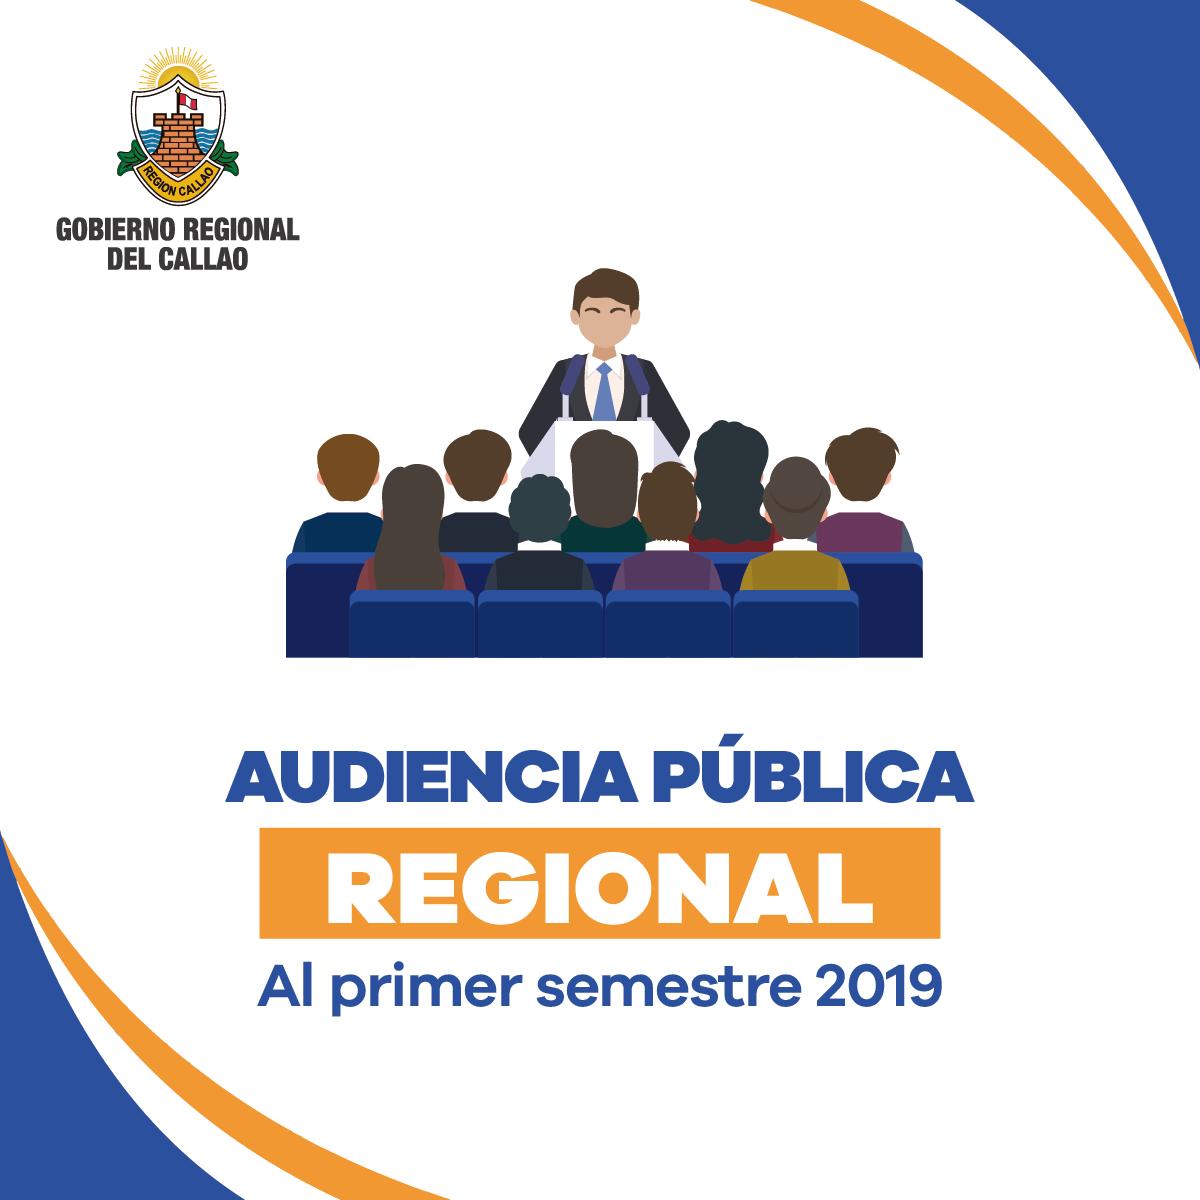 AUDIENCIA PÚBLICA REGIONAL AL PRIMER SEMESTRE 2019